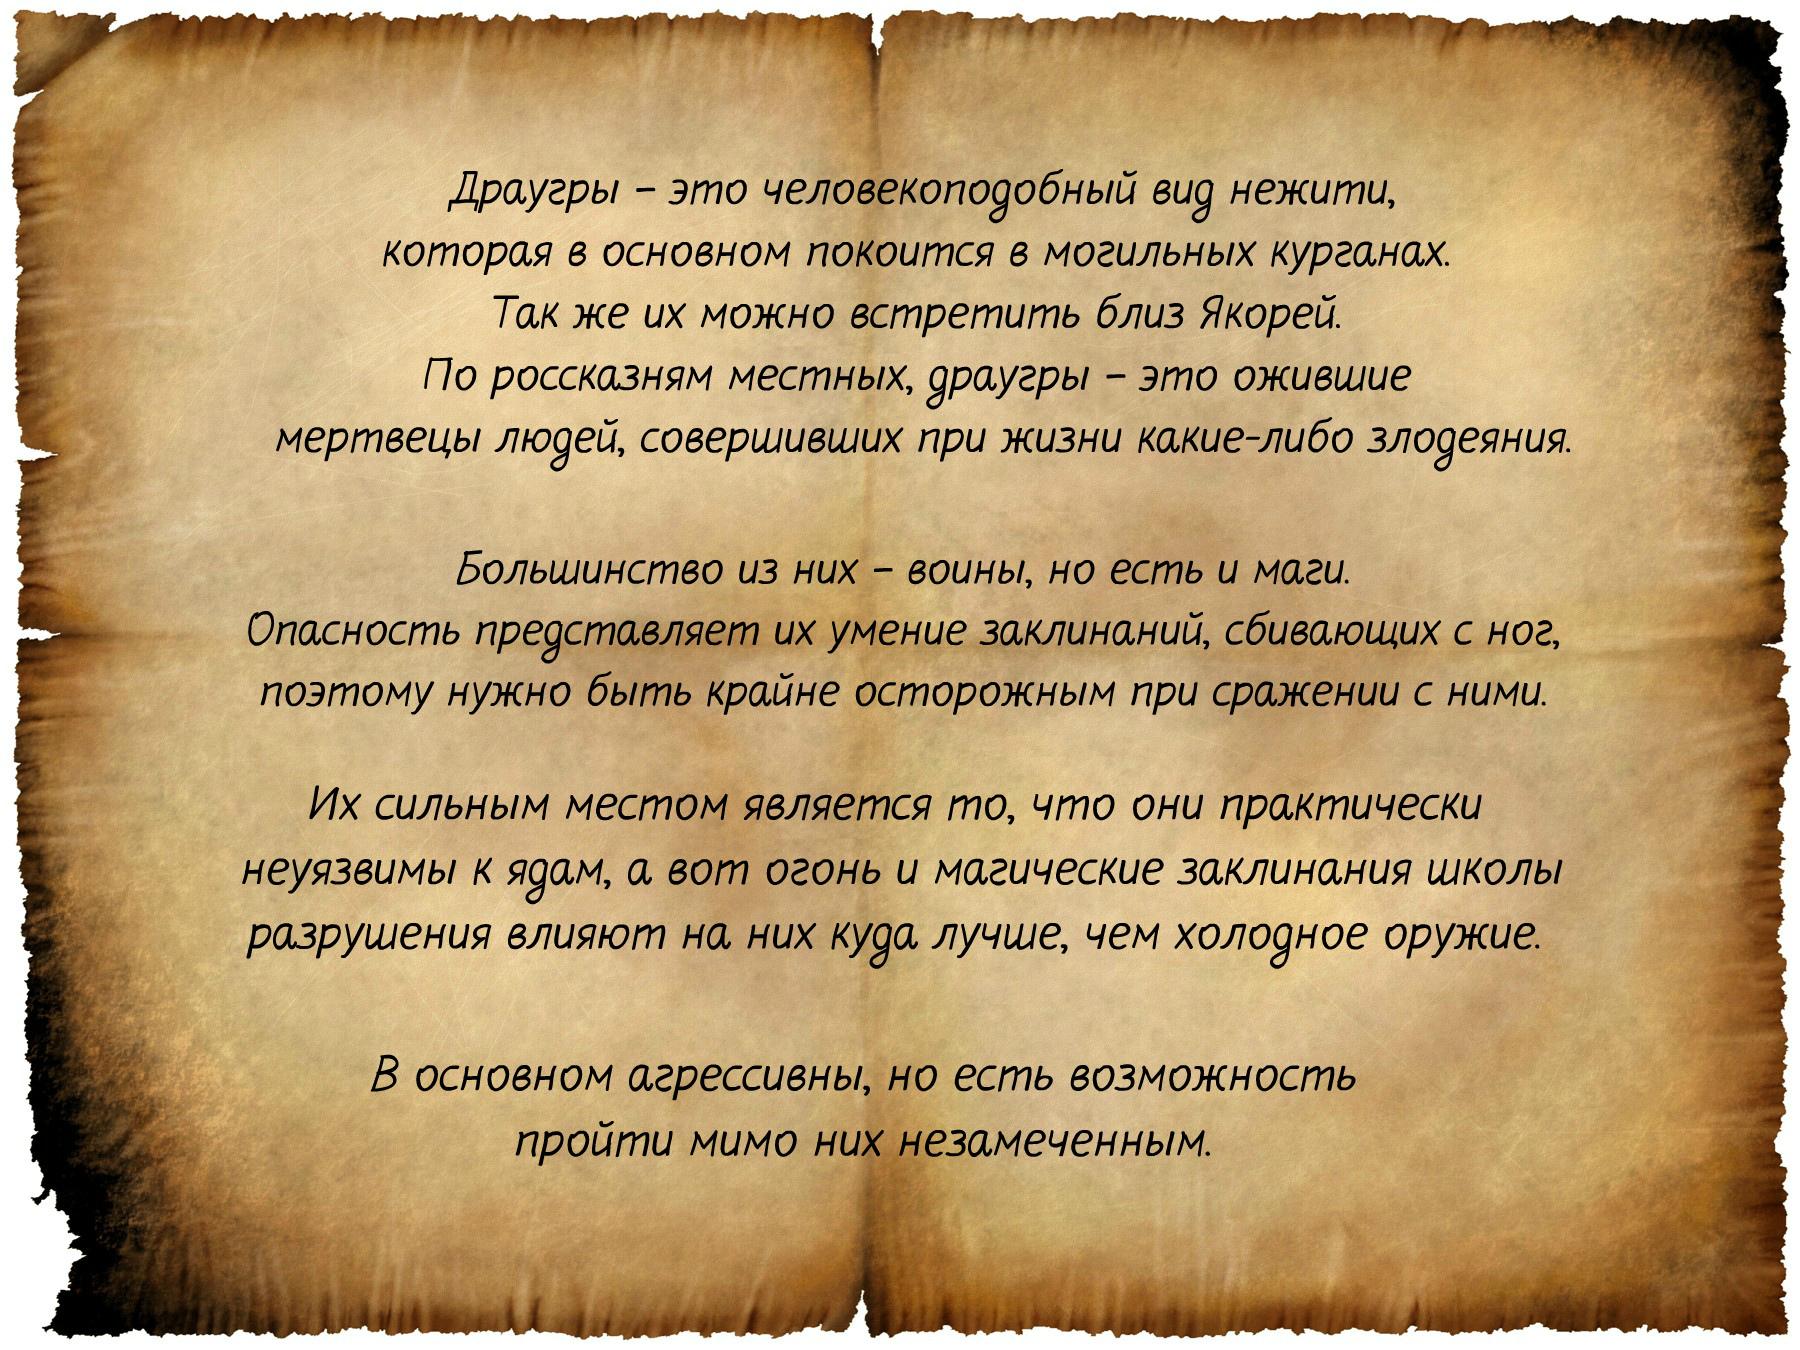 http://s0.uploads.ru/W5nsF.jpg